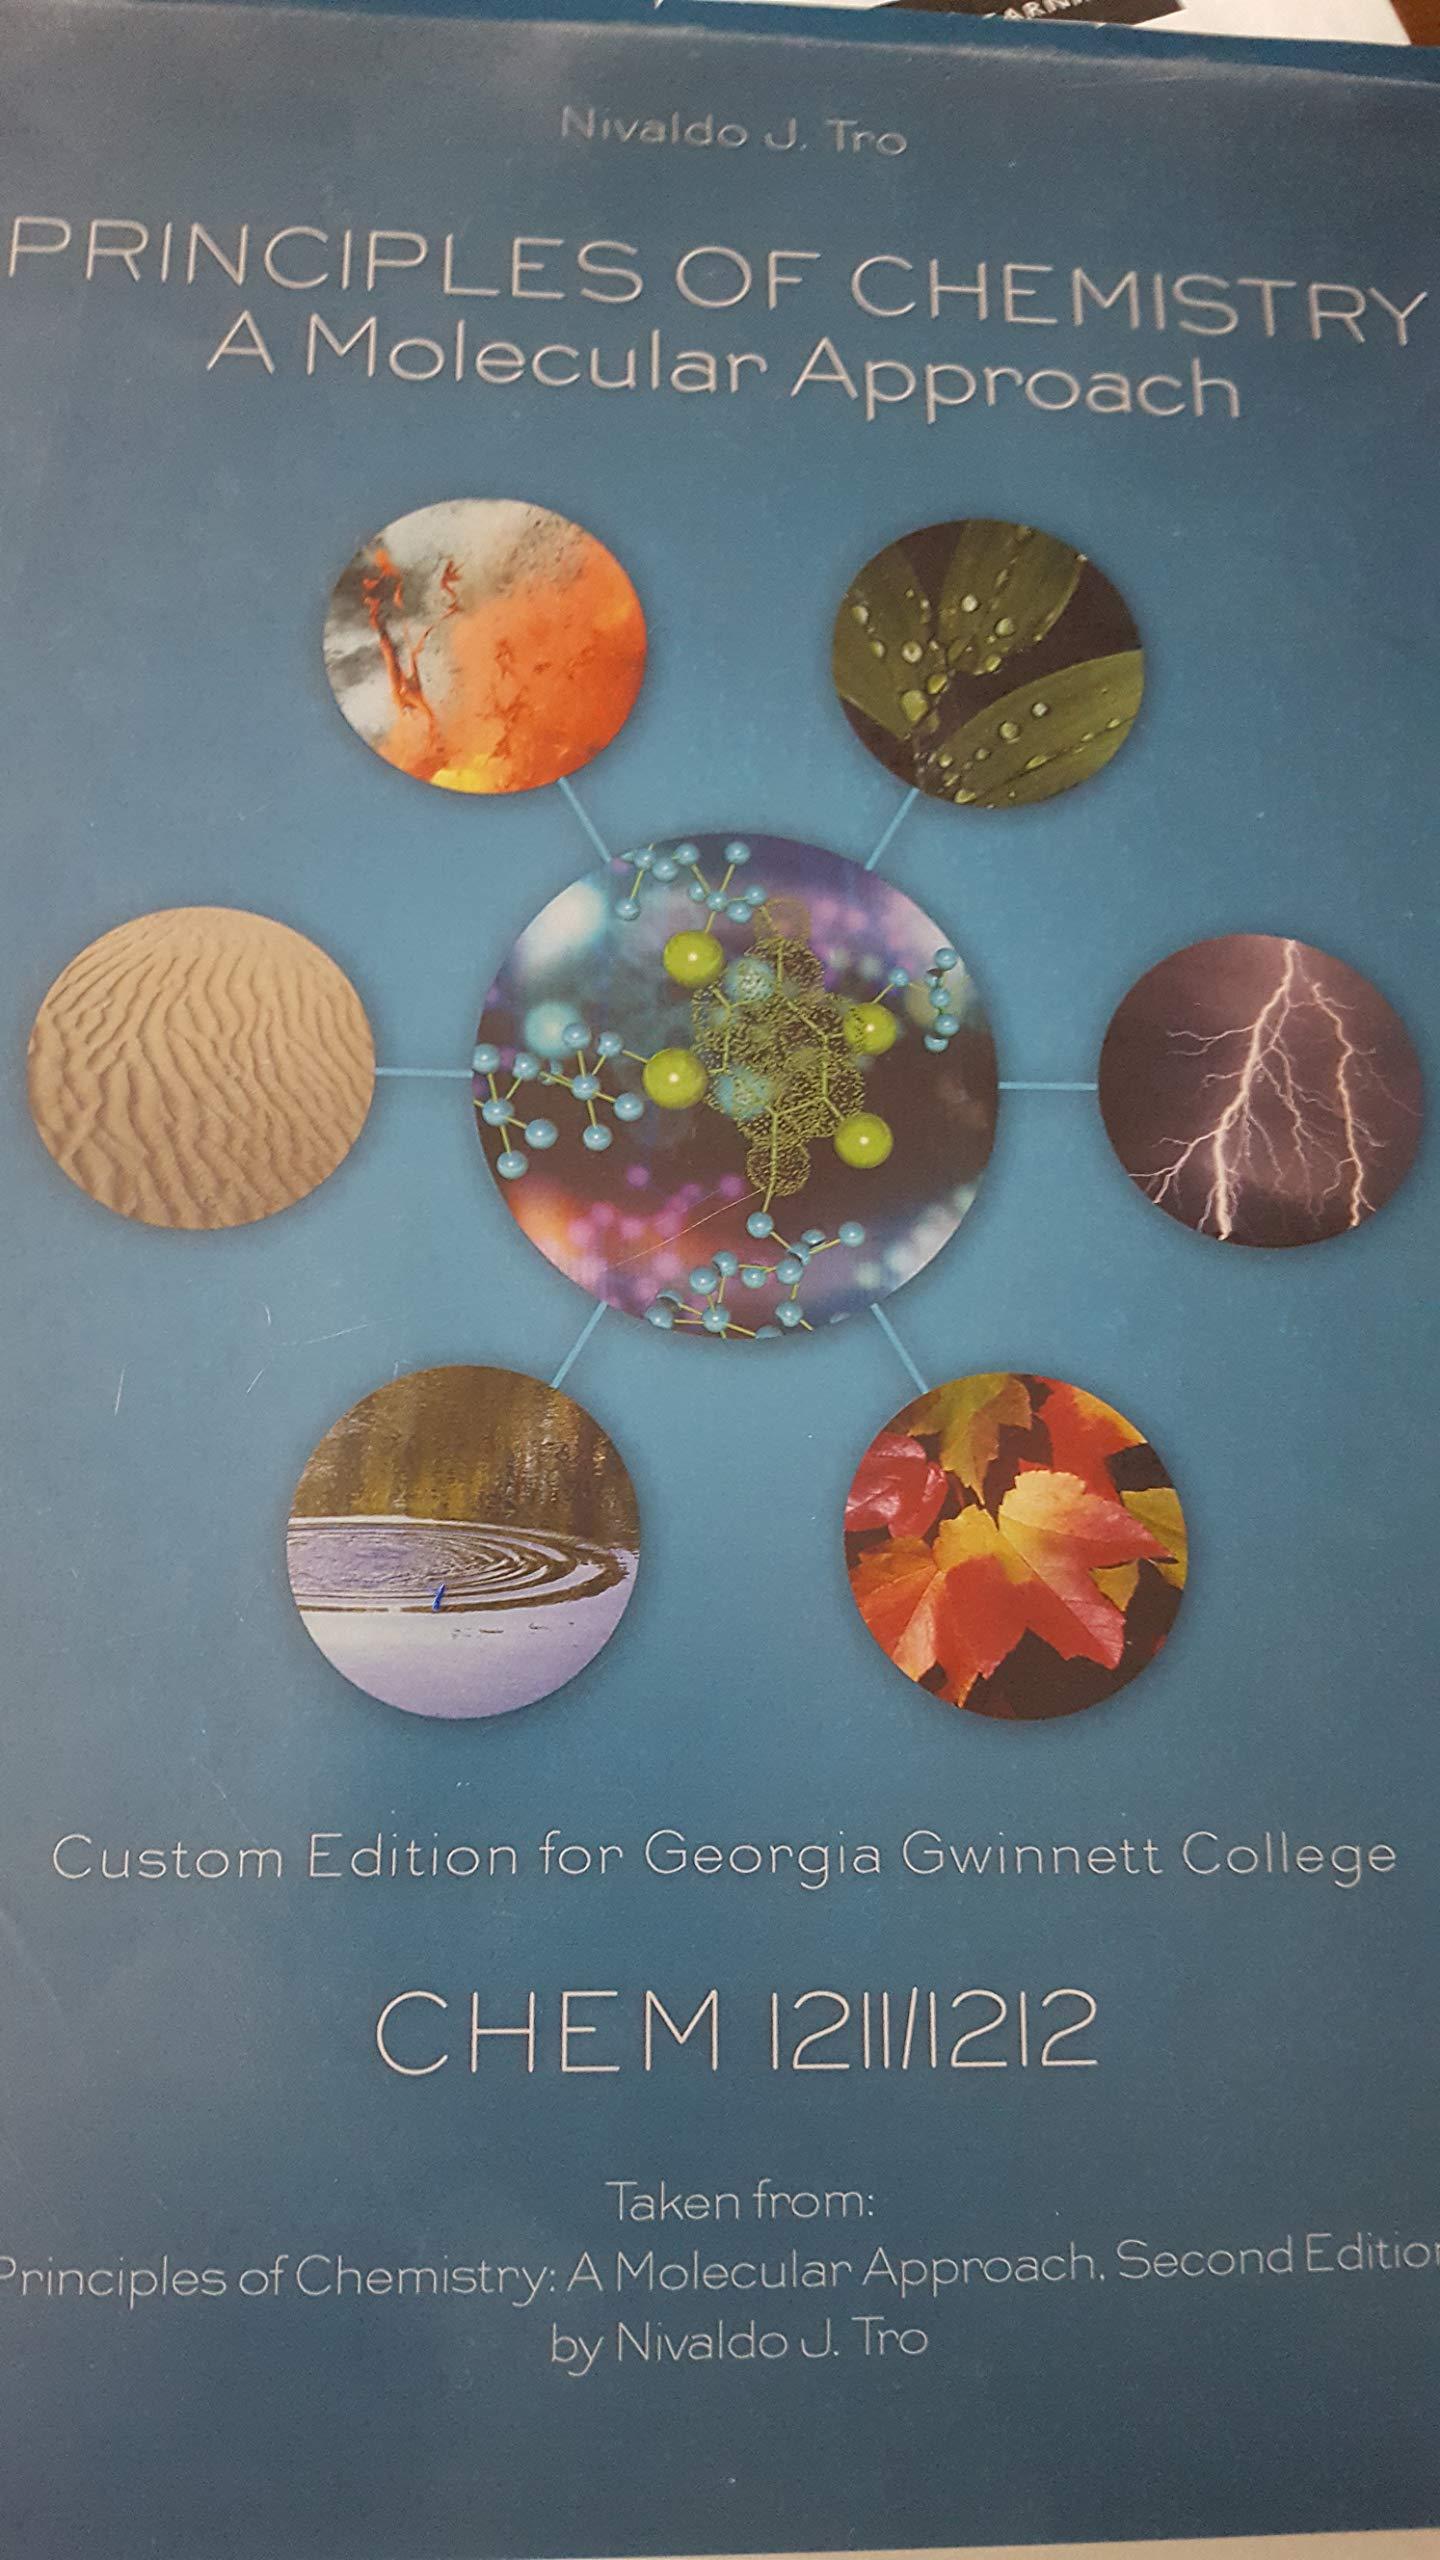 Principles of Chemistry: A Molecular Approach: Nivaldo J. Tro:  9781269328807: Amazon.com: Books